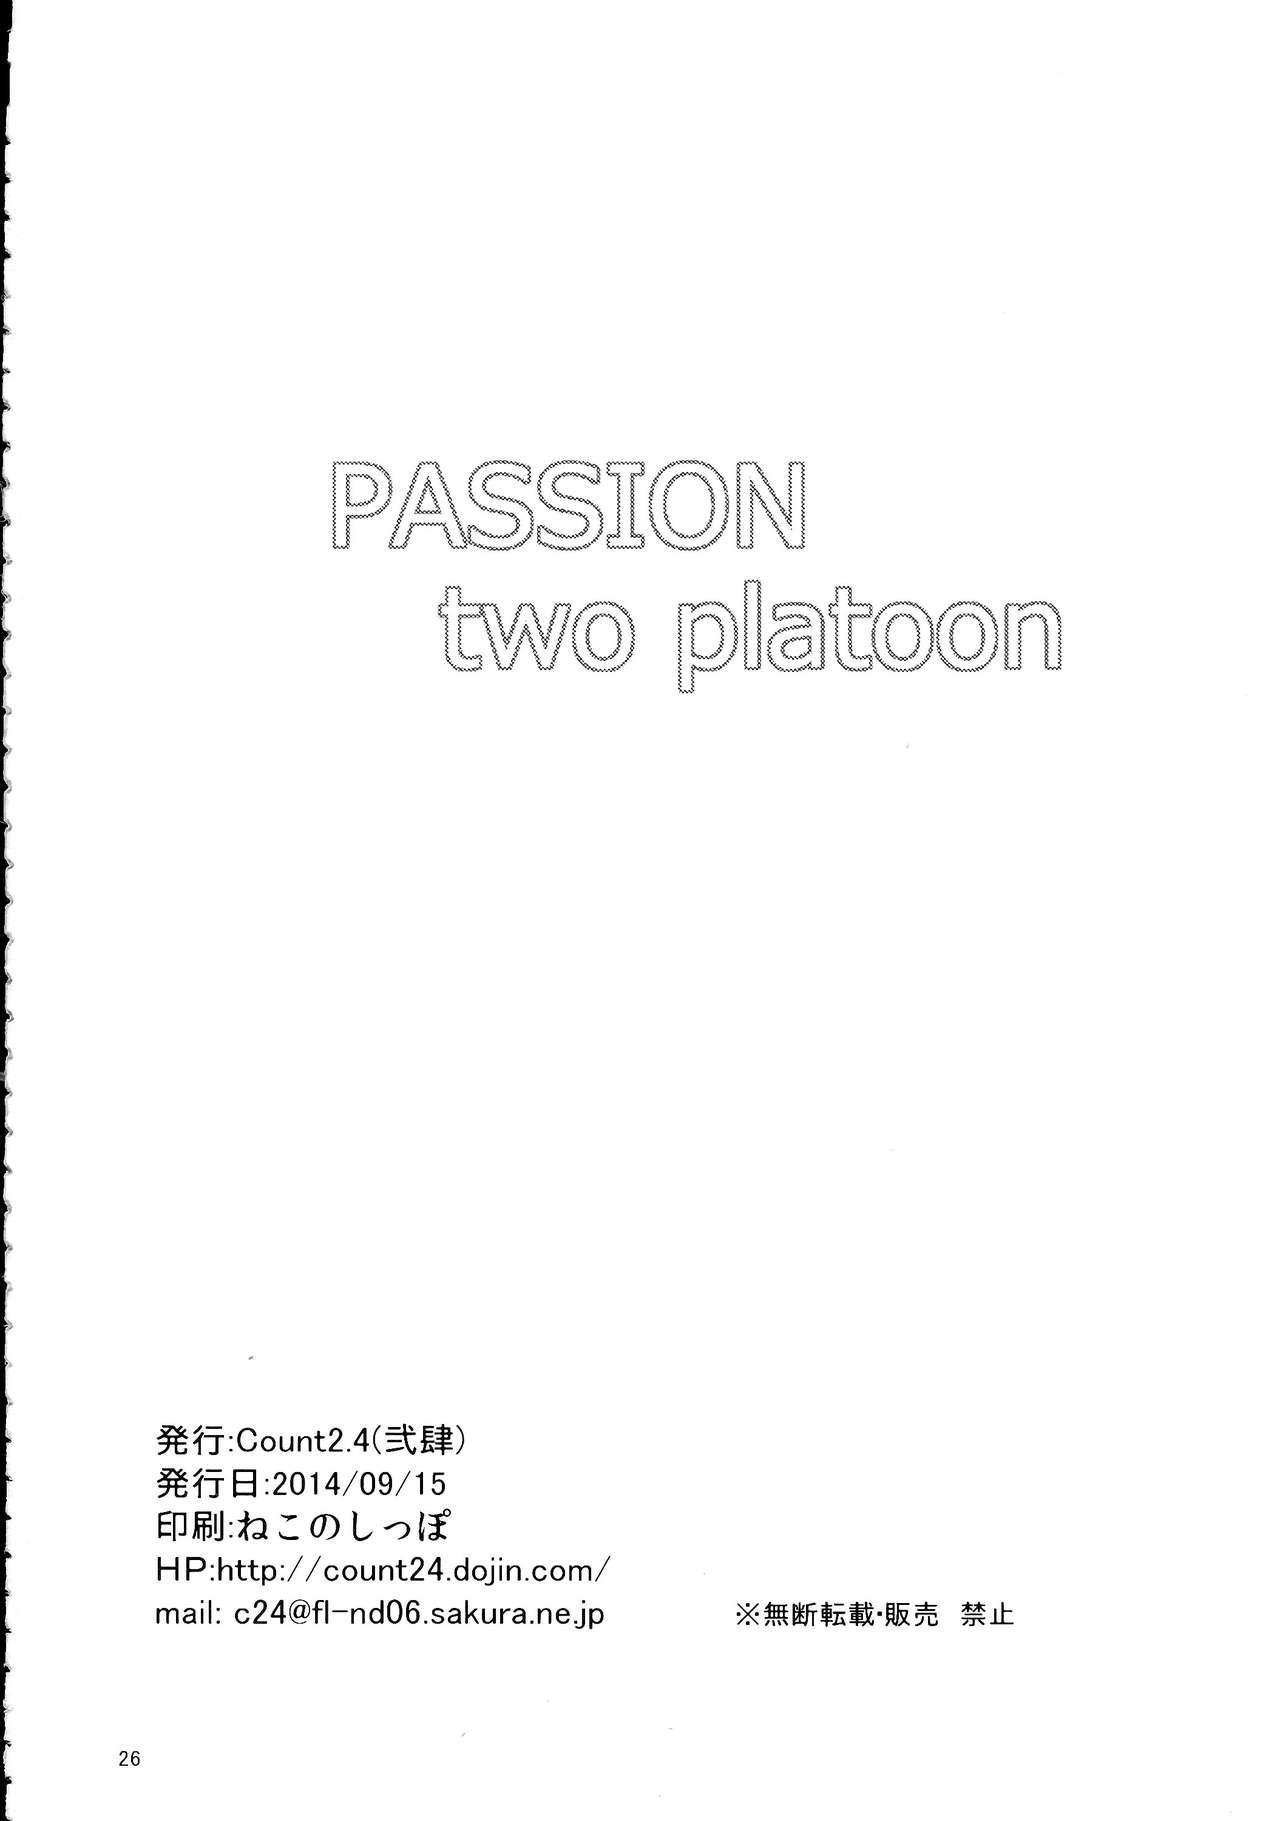 PASSION two platoon 26